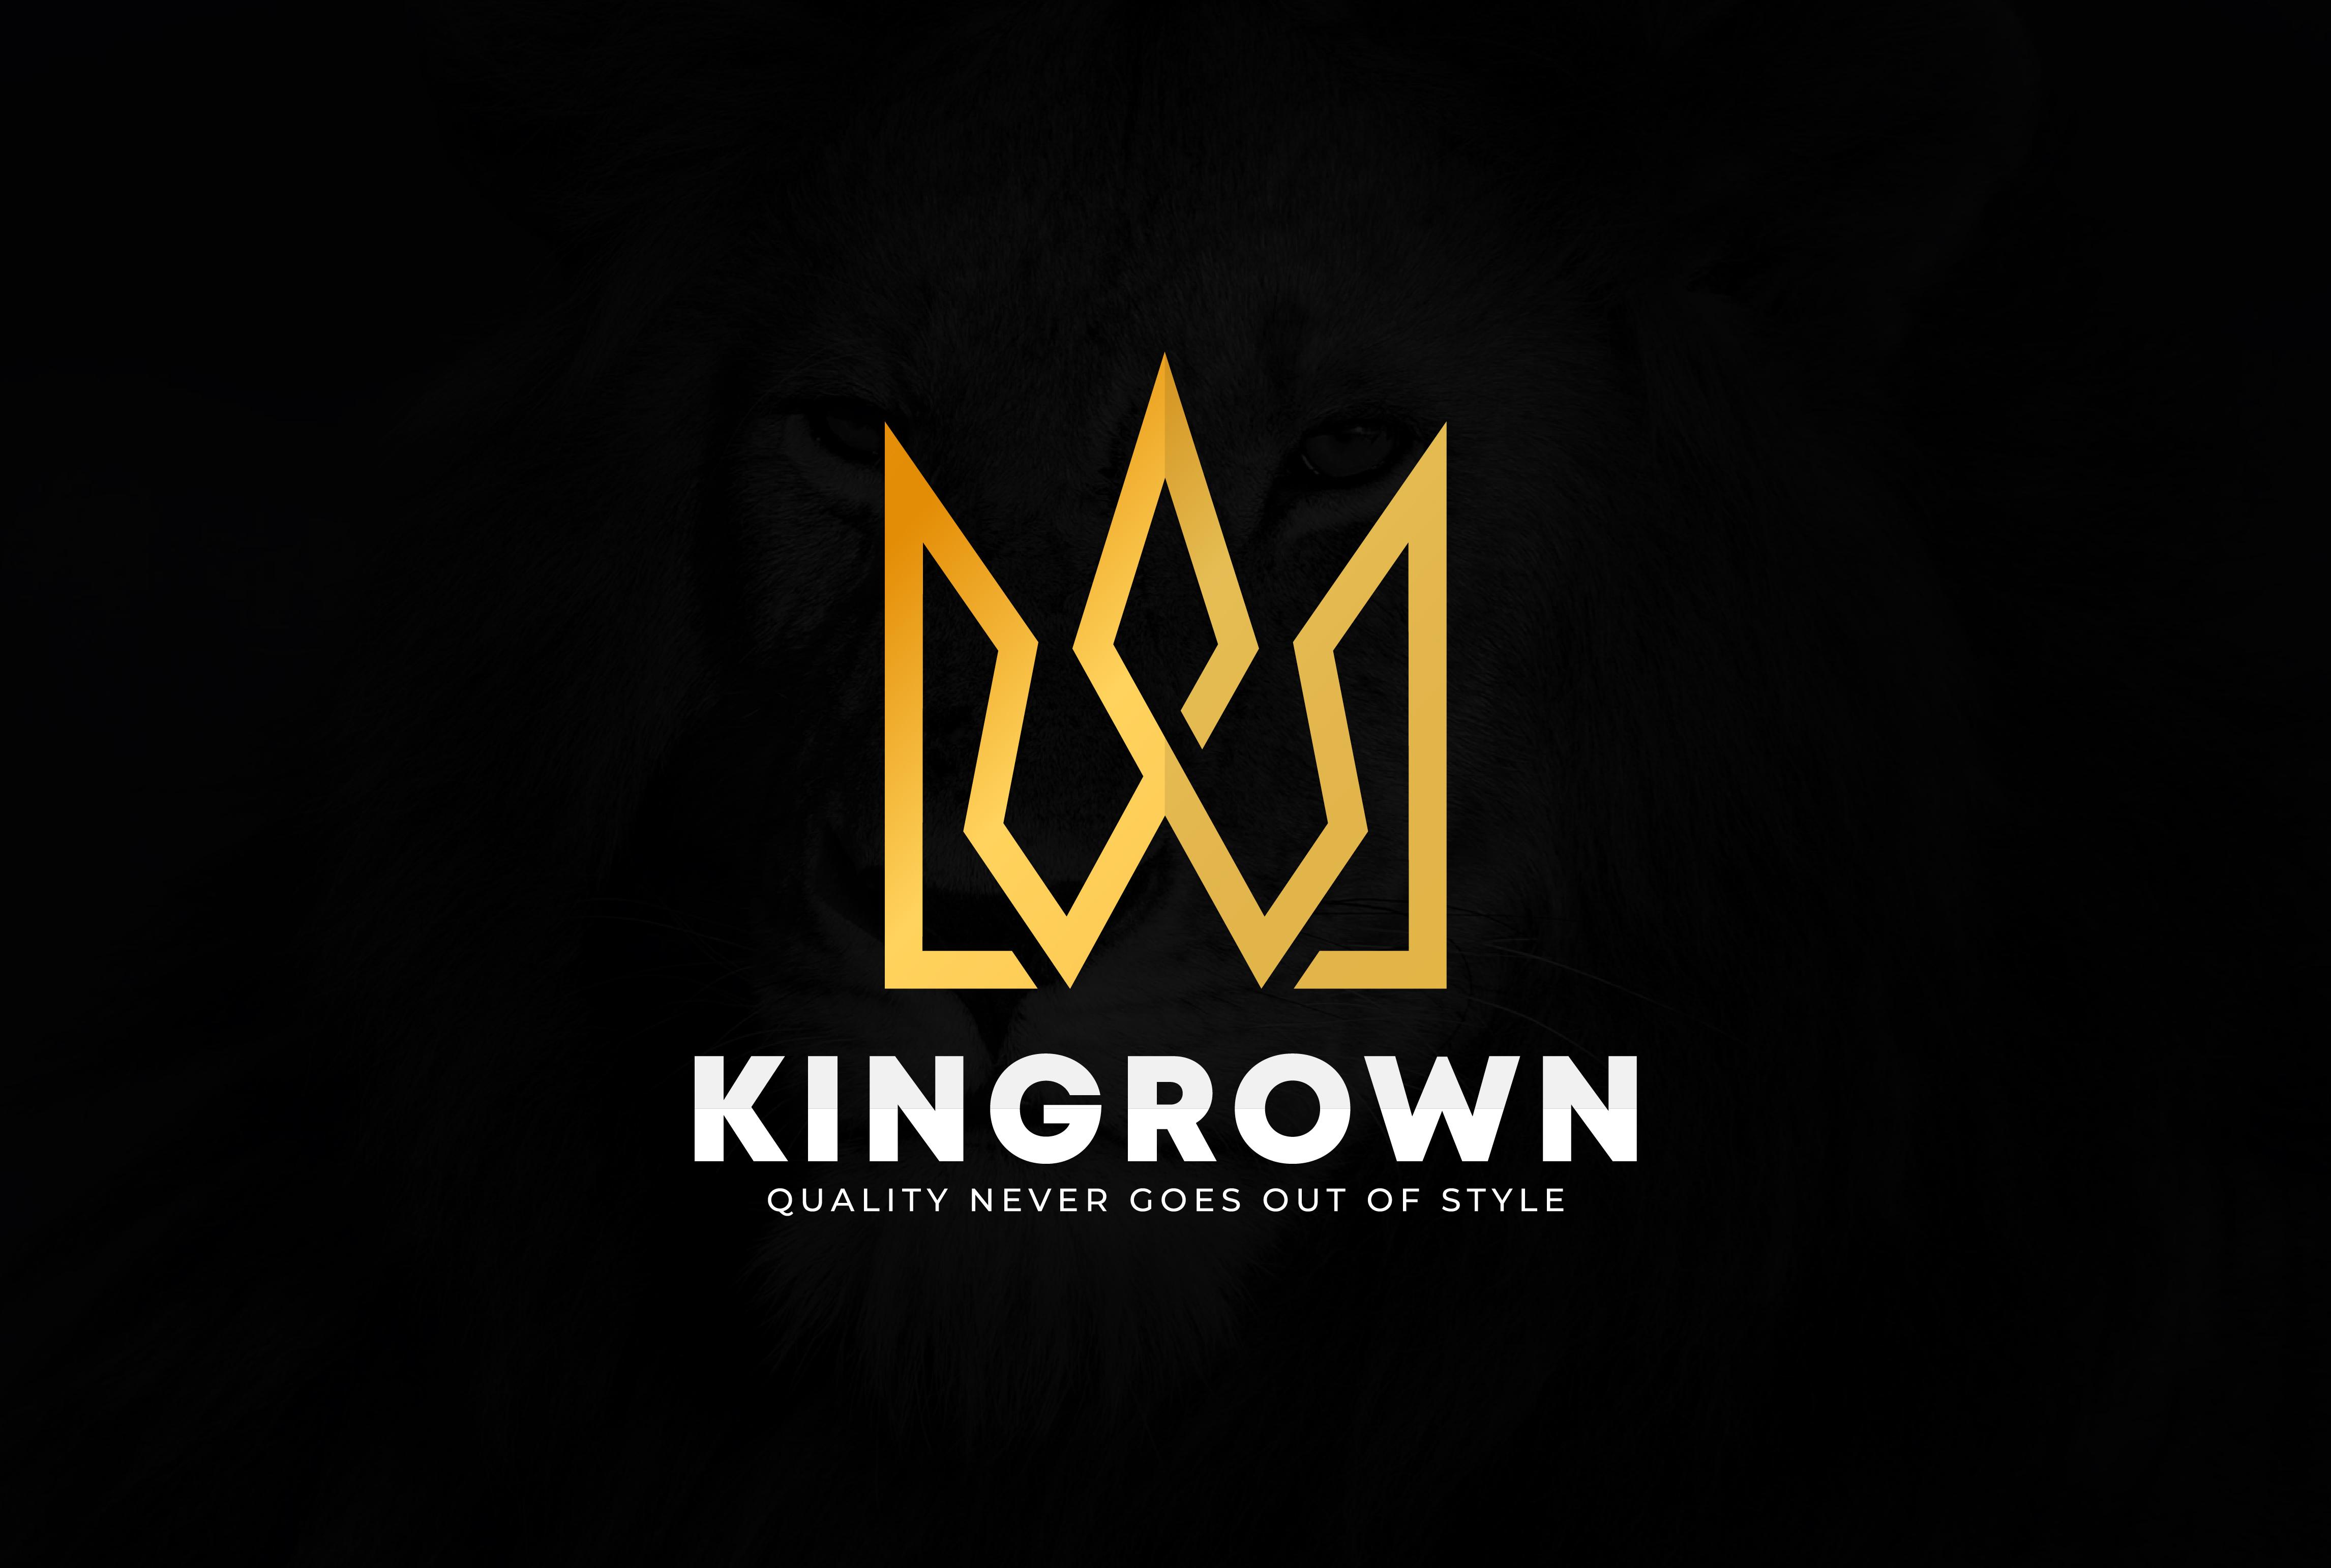 I will modern minimalist custom logo design in your company